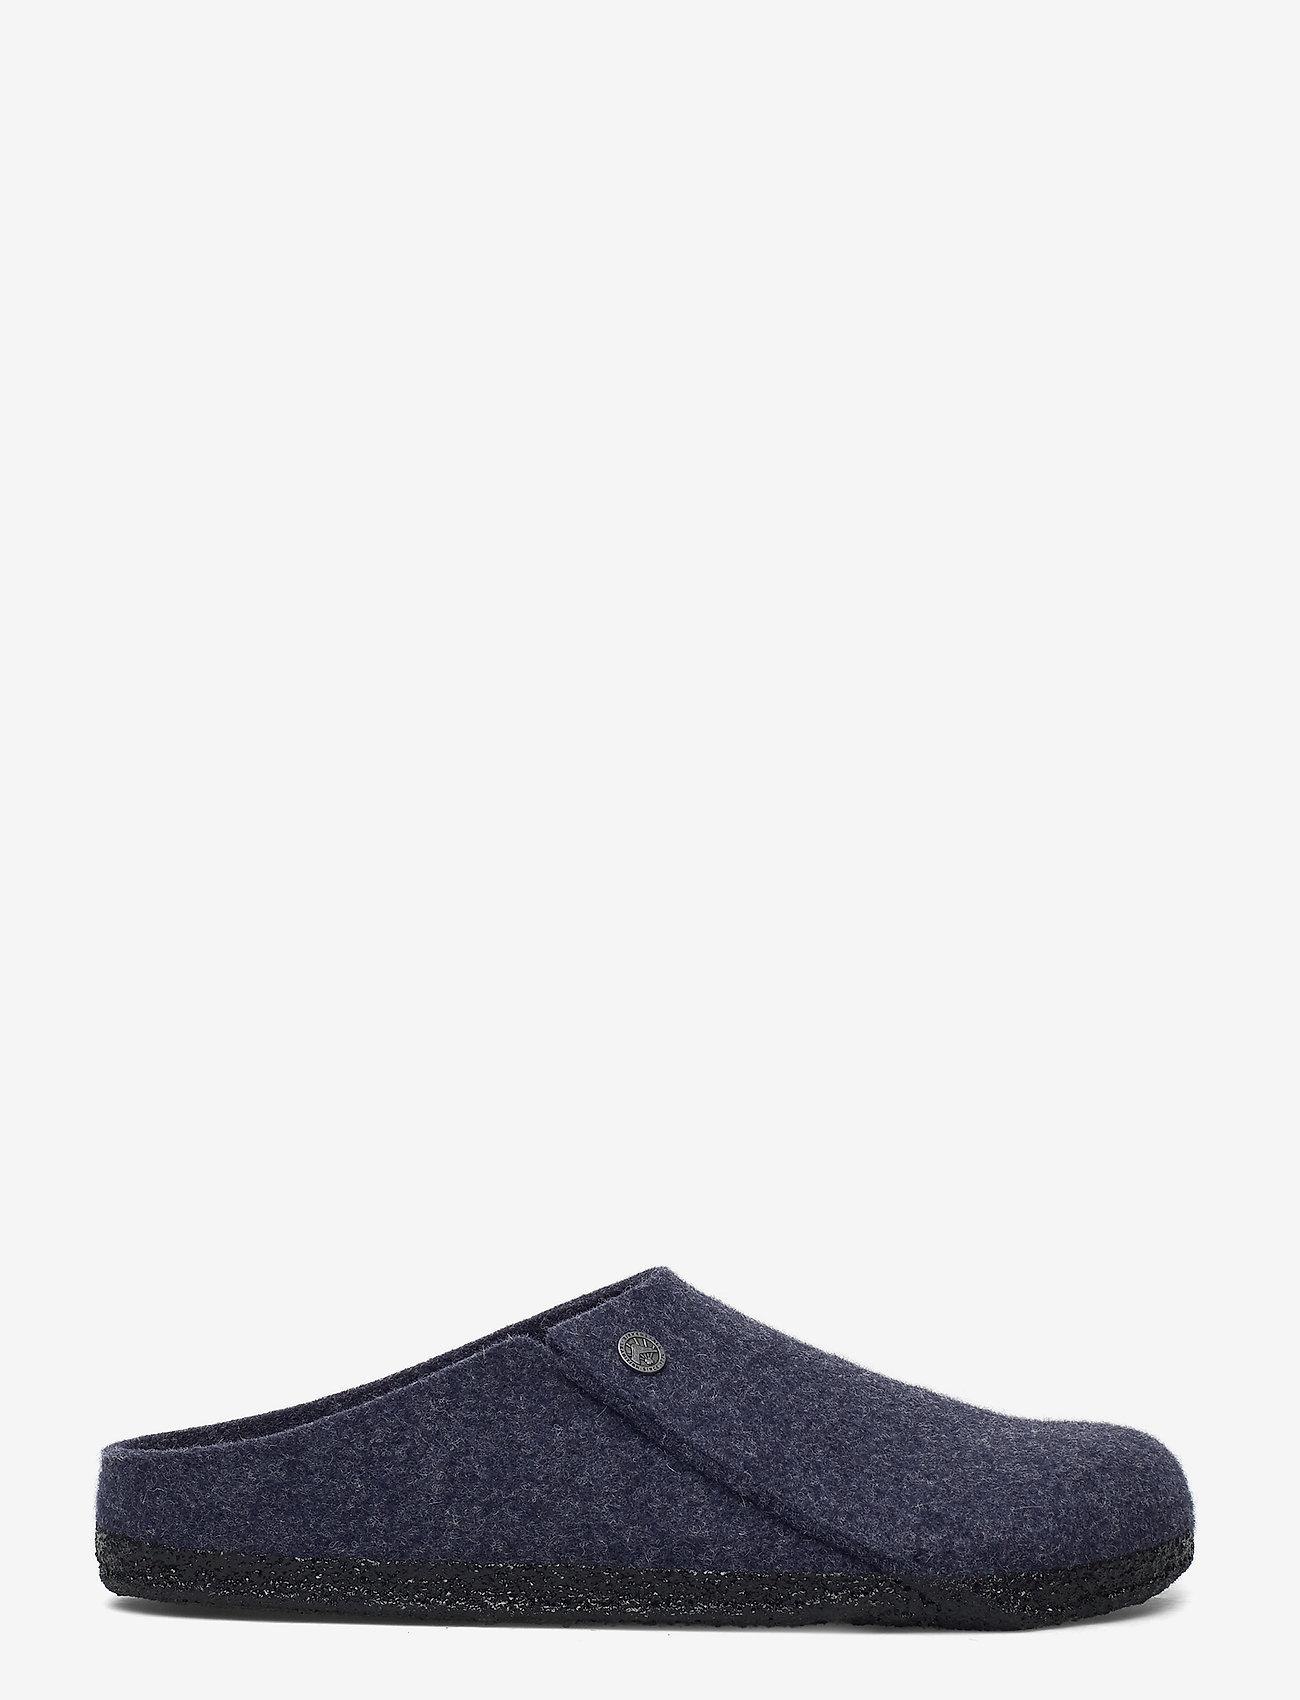 Zermatt Soft Footbed (Dark Blue) (100 €) - Birkenstock nj7NM